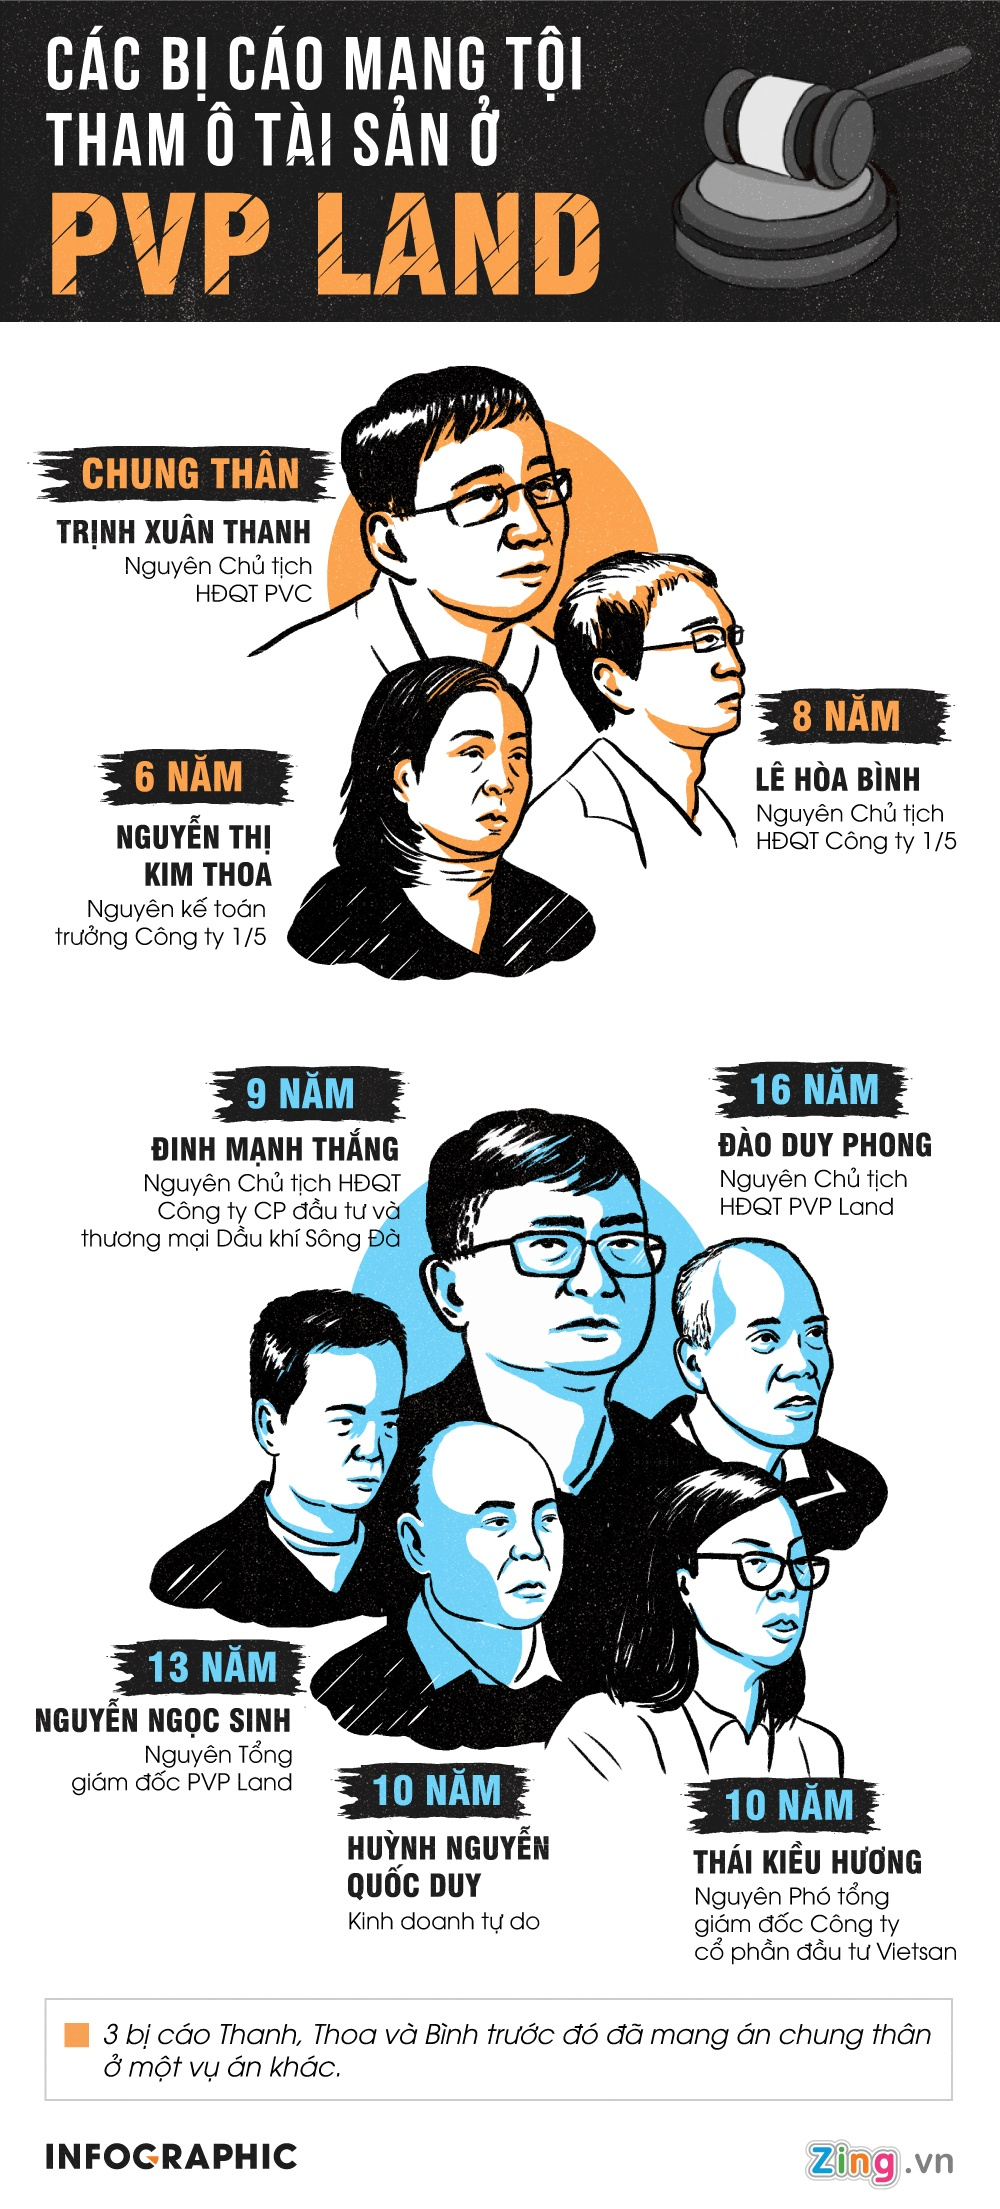 Tuyen an vu Trinh Xuan Thanh anh 1